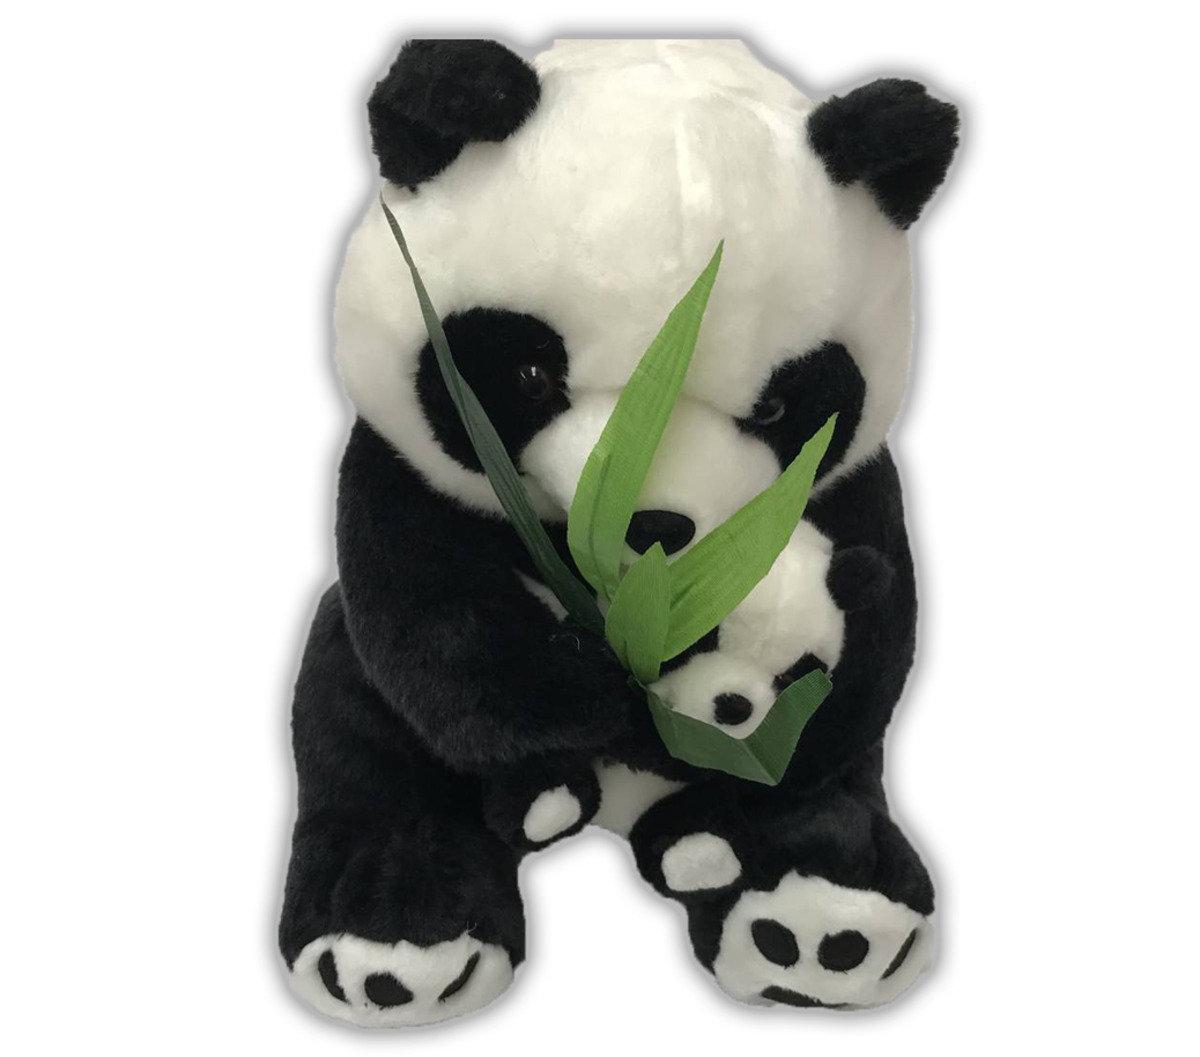 Panda Collections Big Foot Panda Mum Baby Hold A Bamboo Hktvmall Online Shopping